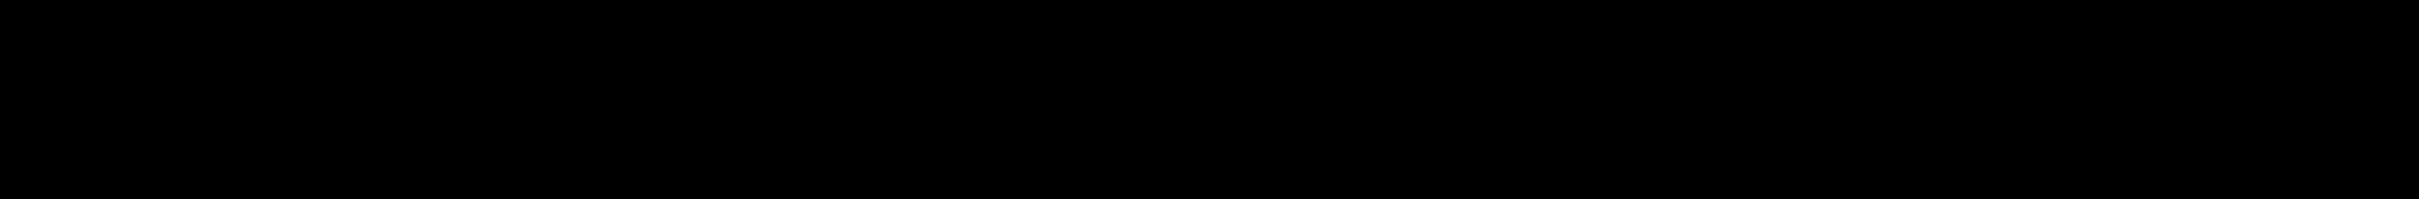 process-band.jpg